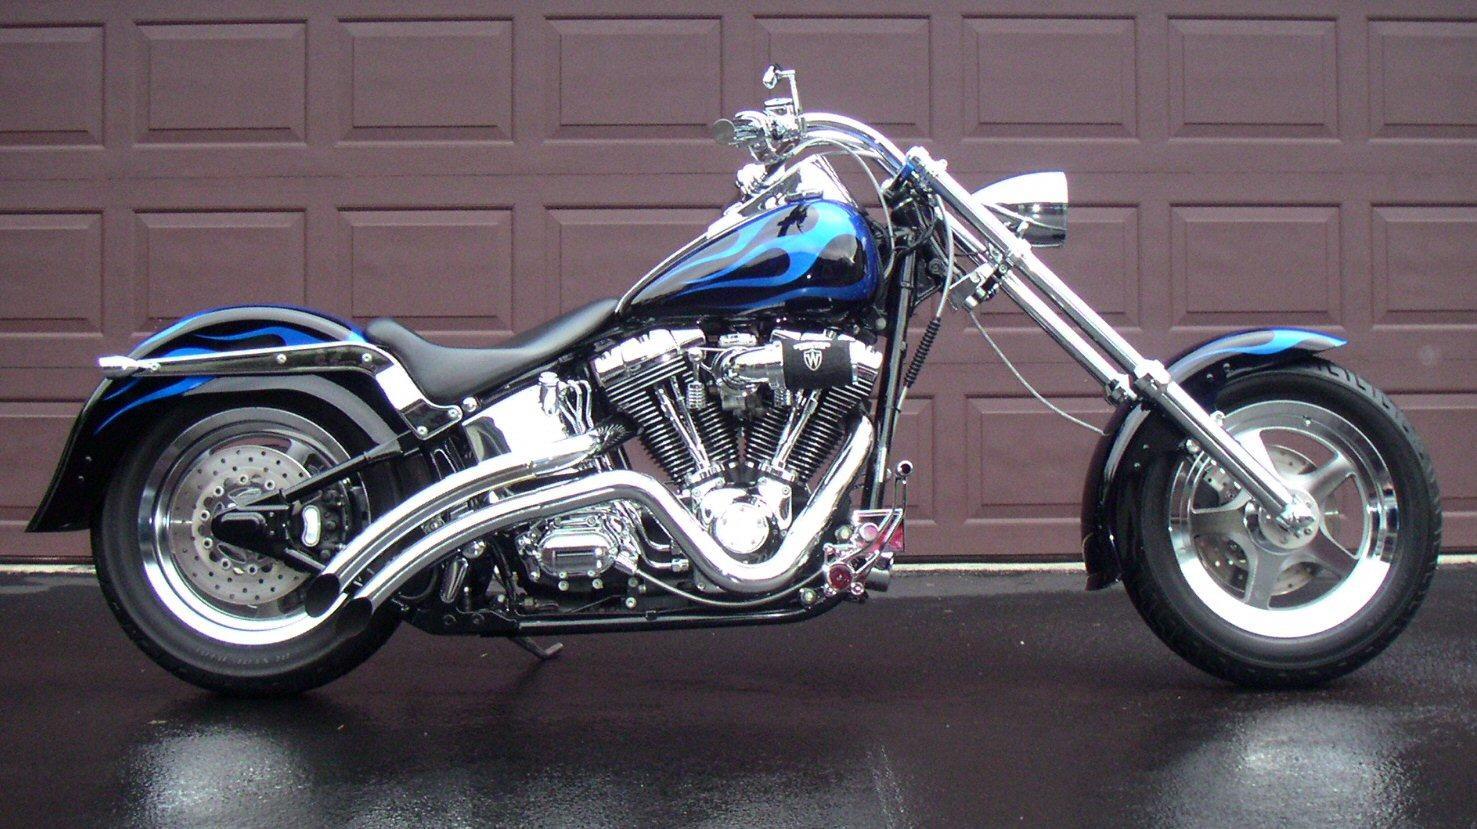 Harley Davidson Movie: Harley Davidson Chopper HD Wallpapers